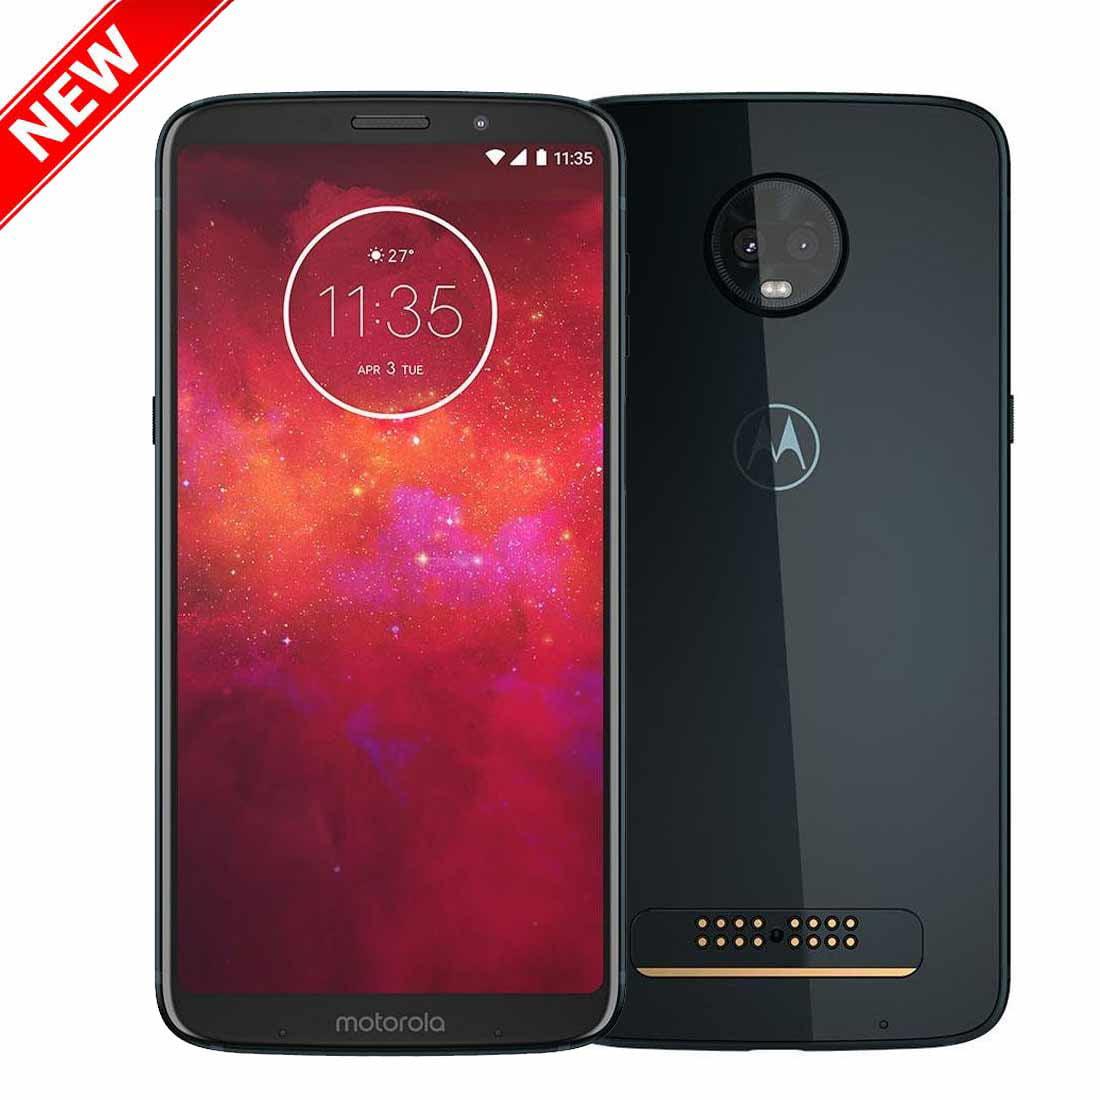 "New Motorola Moto Z3 Play 64GB XT1929-6 Dual SIM GSM Factory Unlocked 4G LTE 6.01"" Super AMOLED Display 4GB RAM... by MOTOROLA"